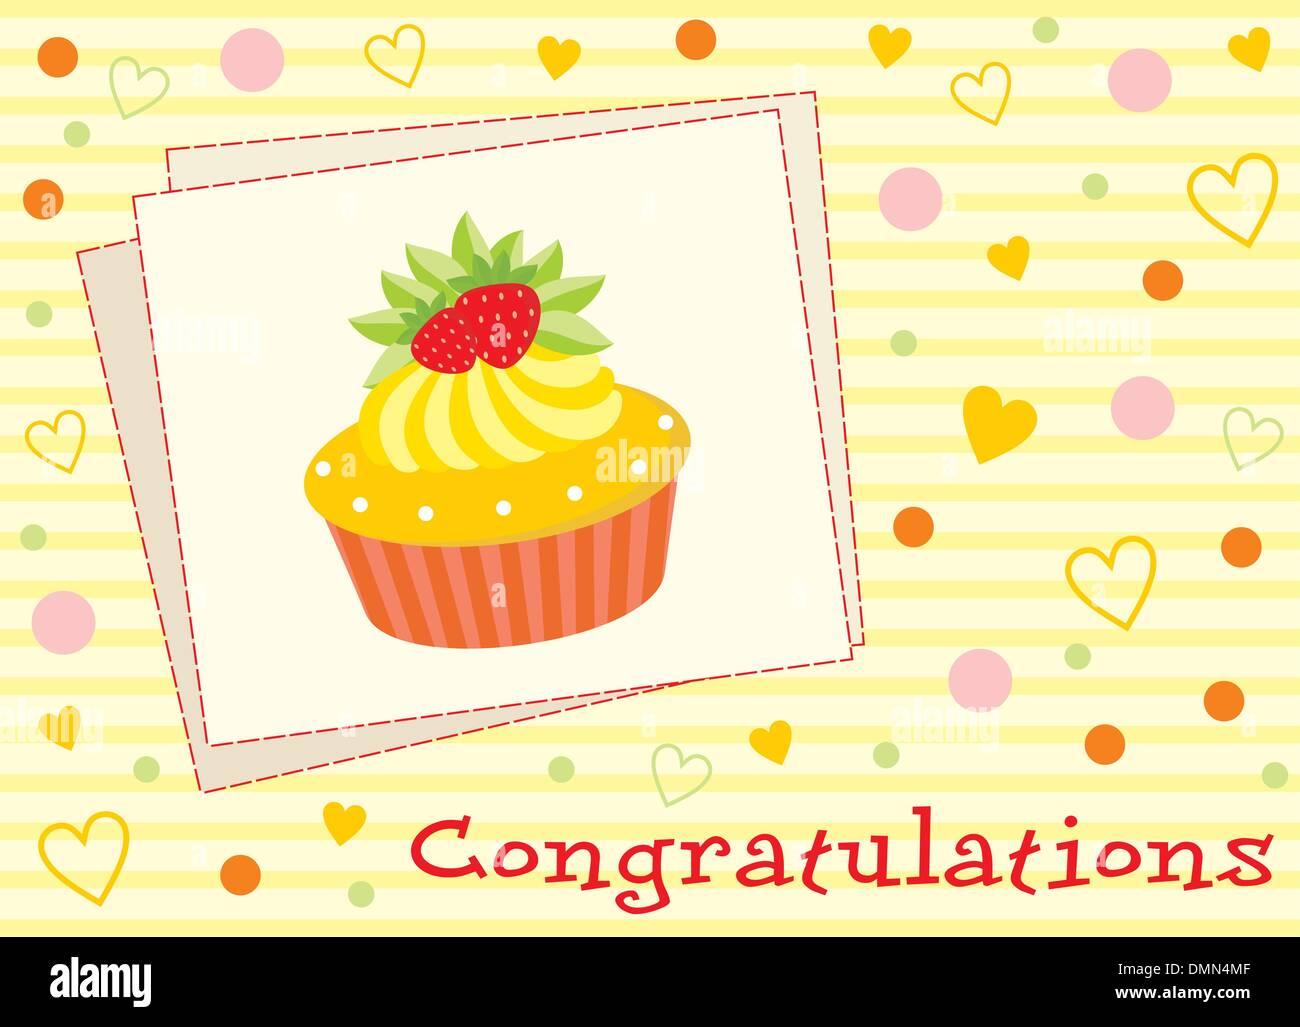 Drawing Birthday Cake Stockfotos & Drawing Birthday Cake Bilder ...